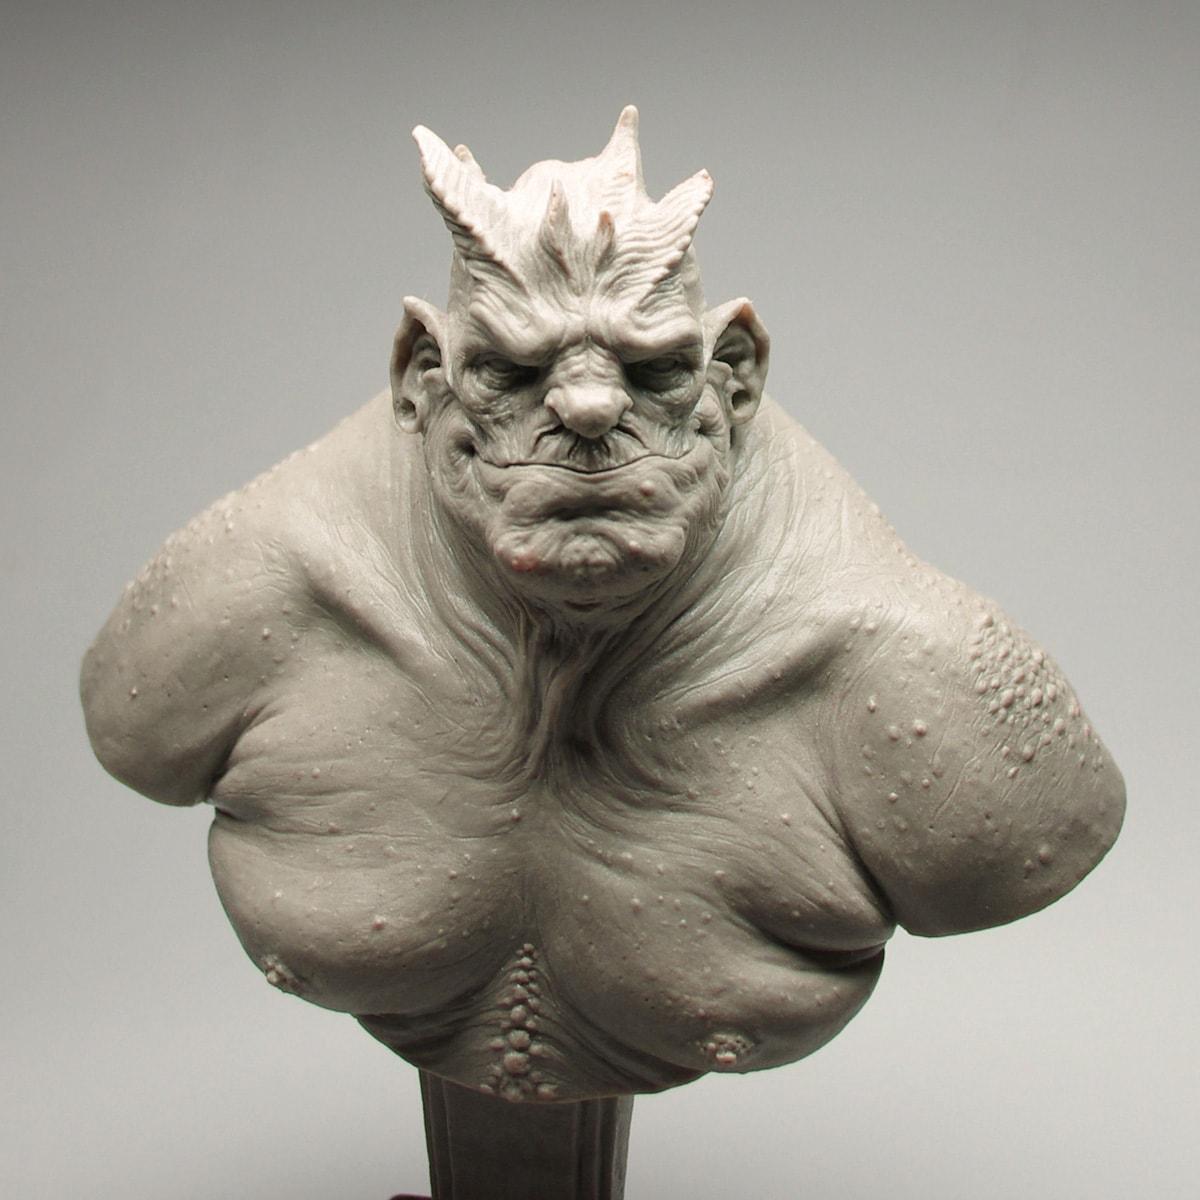 Demon-obese2